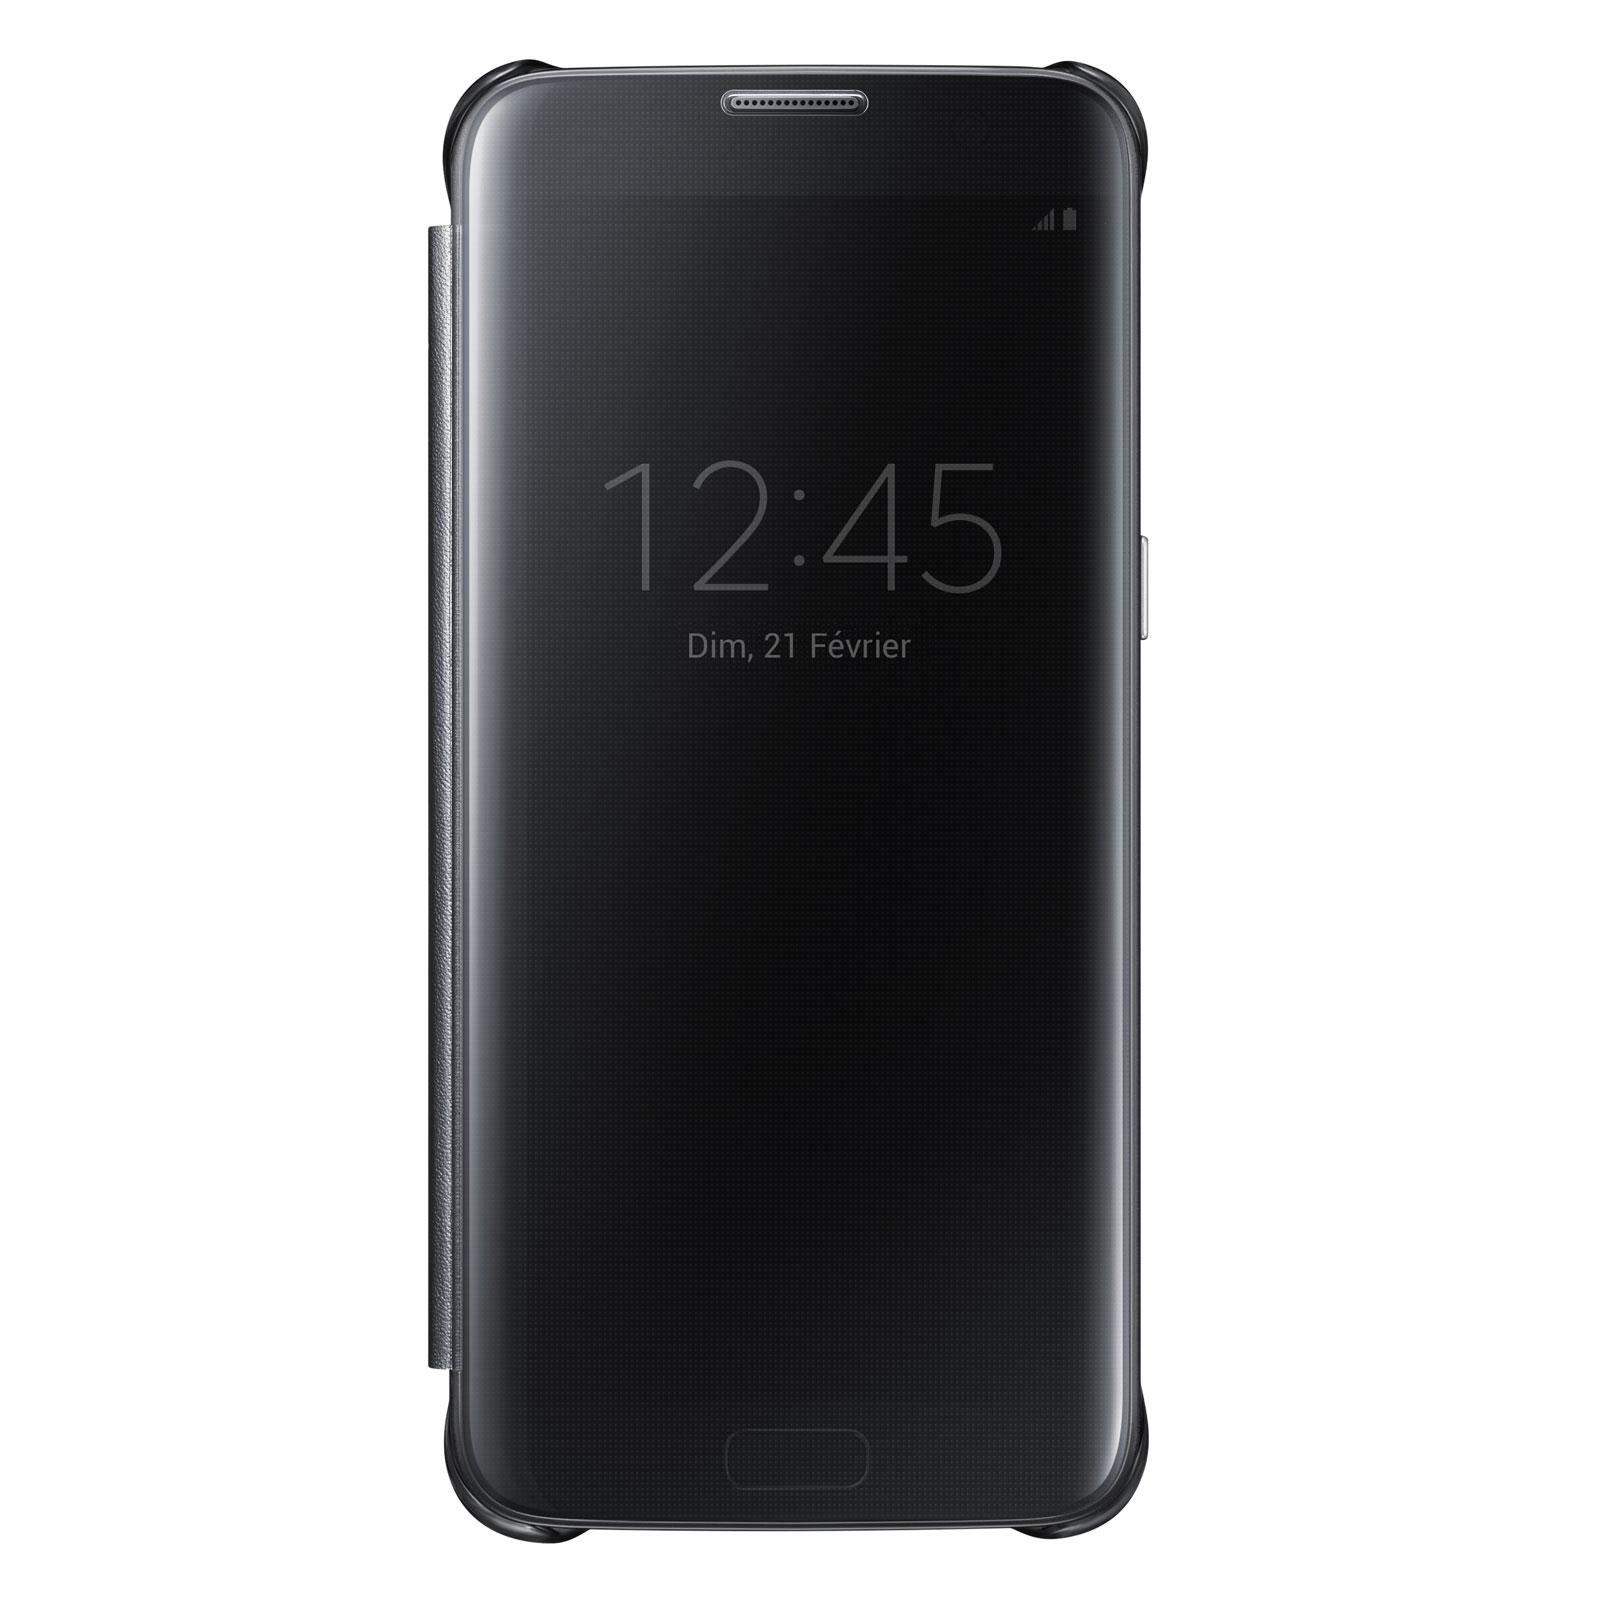 Etui téléphone Samsung Clear View Cover Noir Samsung Galaxy S7 Edge Etui à  rabat avec affichage 601aae17a643